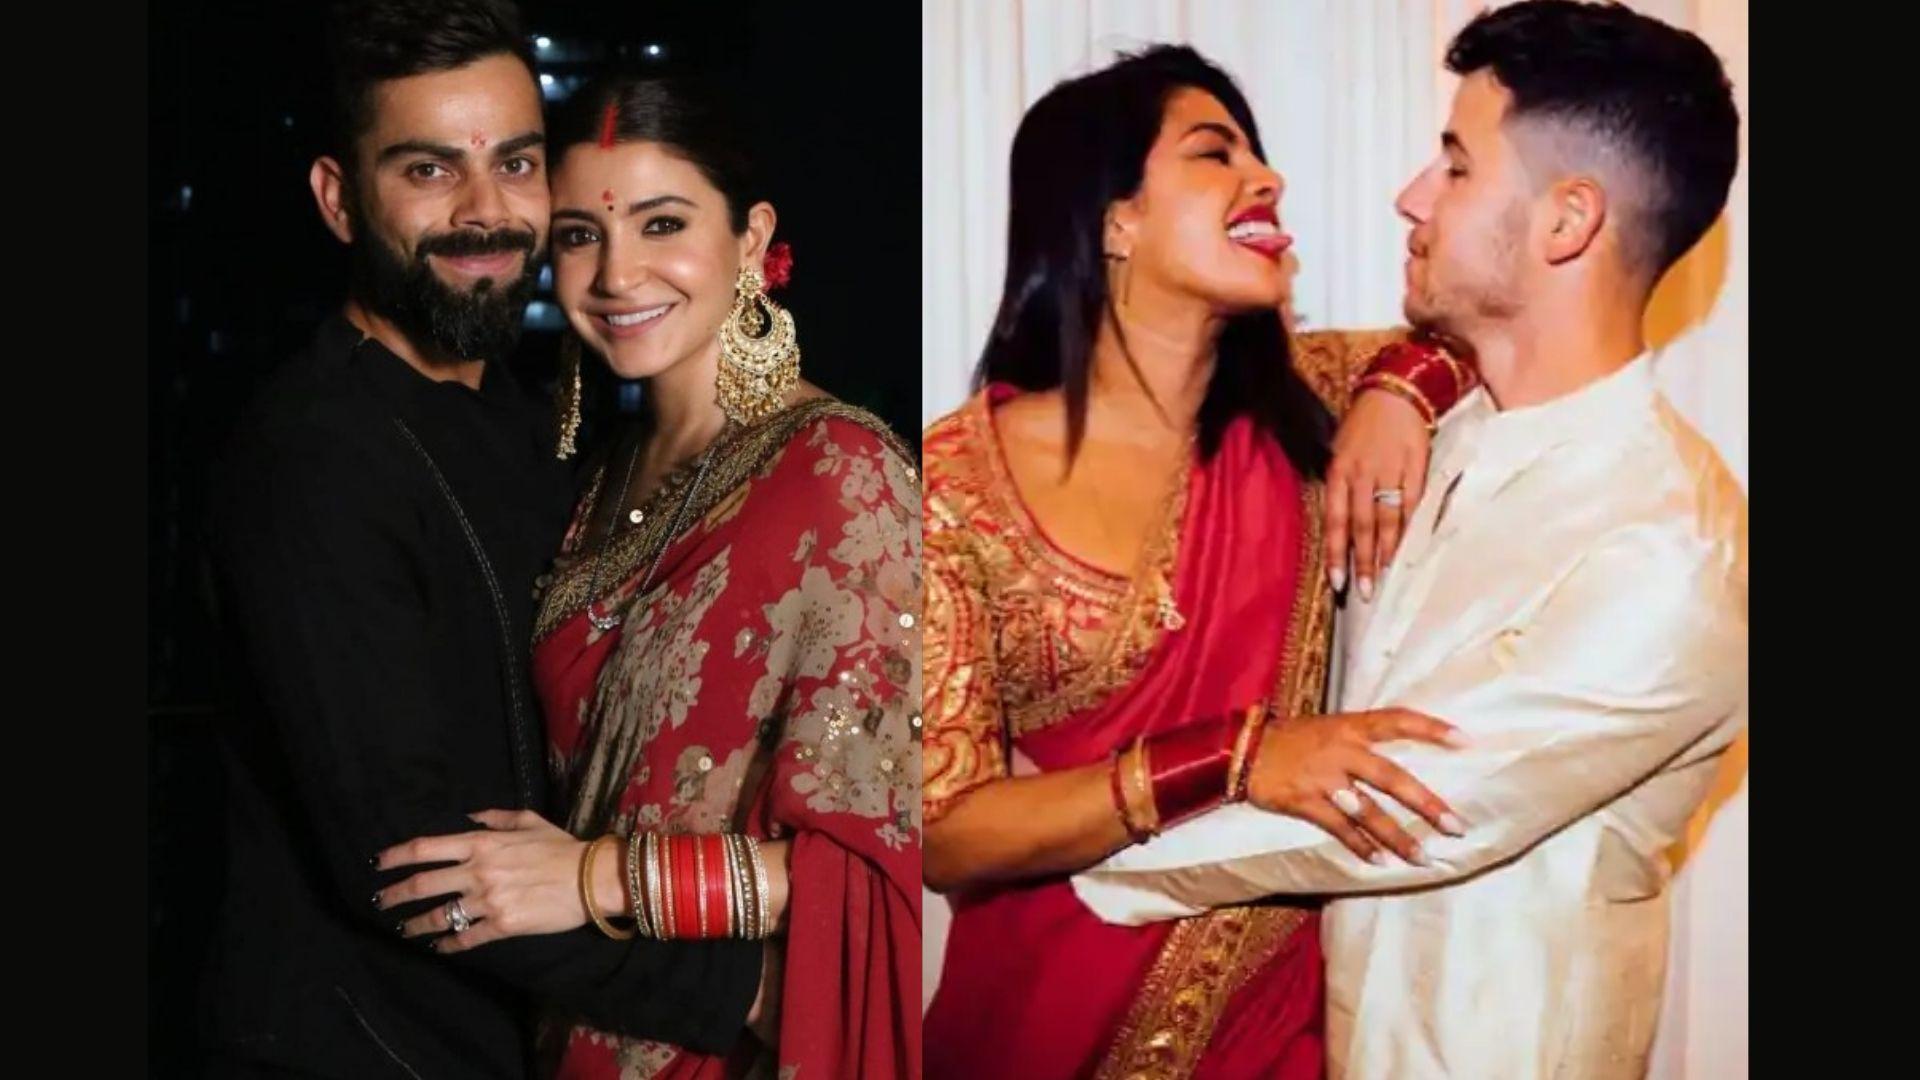 Karwa Chauth 2021: Bollywood Stars Like Anushka Sharma, Priyanka Chopra, And Others Who Never Miss To Celebrate The Auspicious Occasion